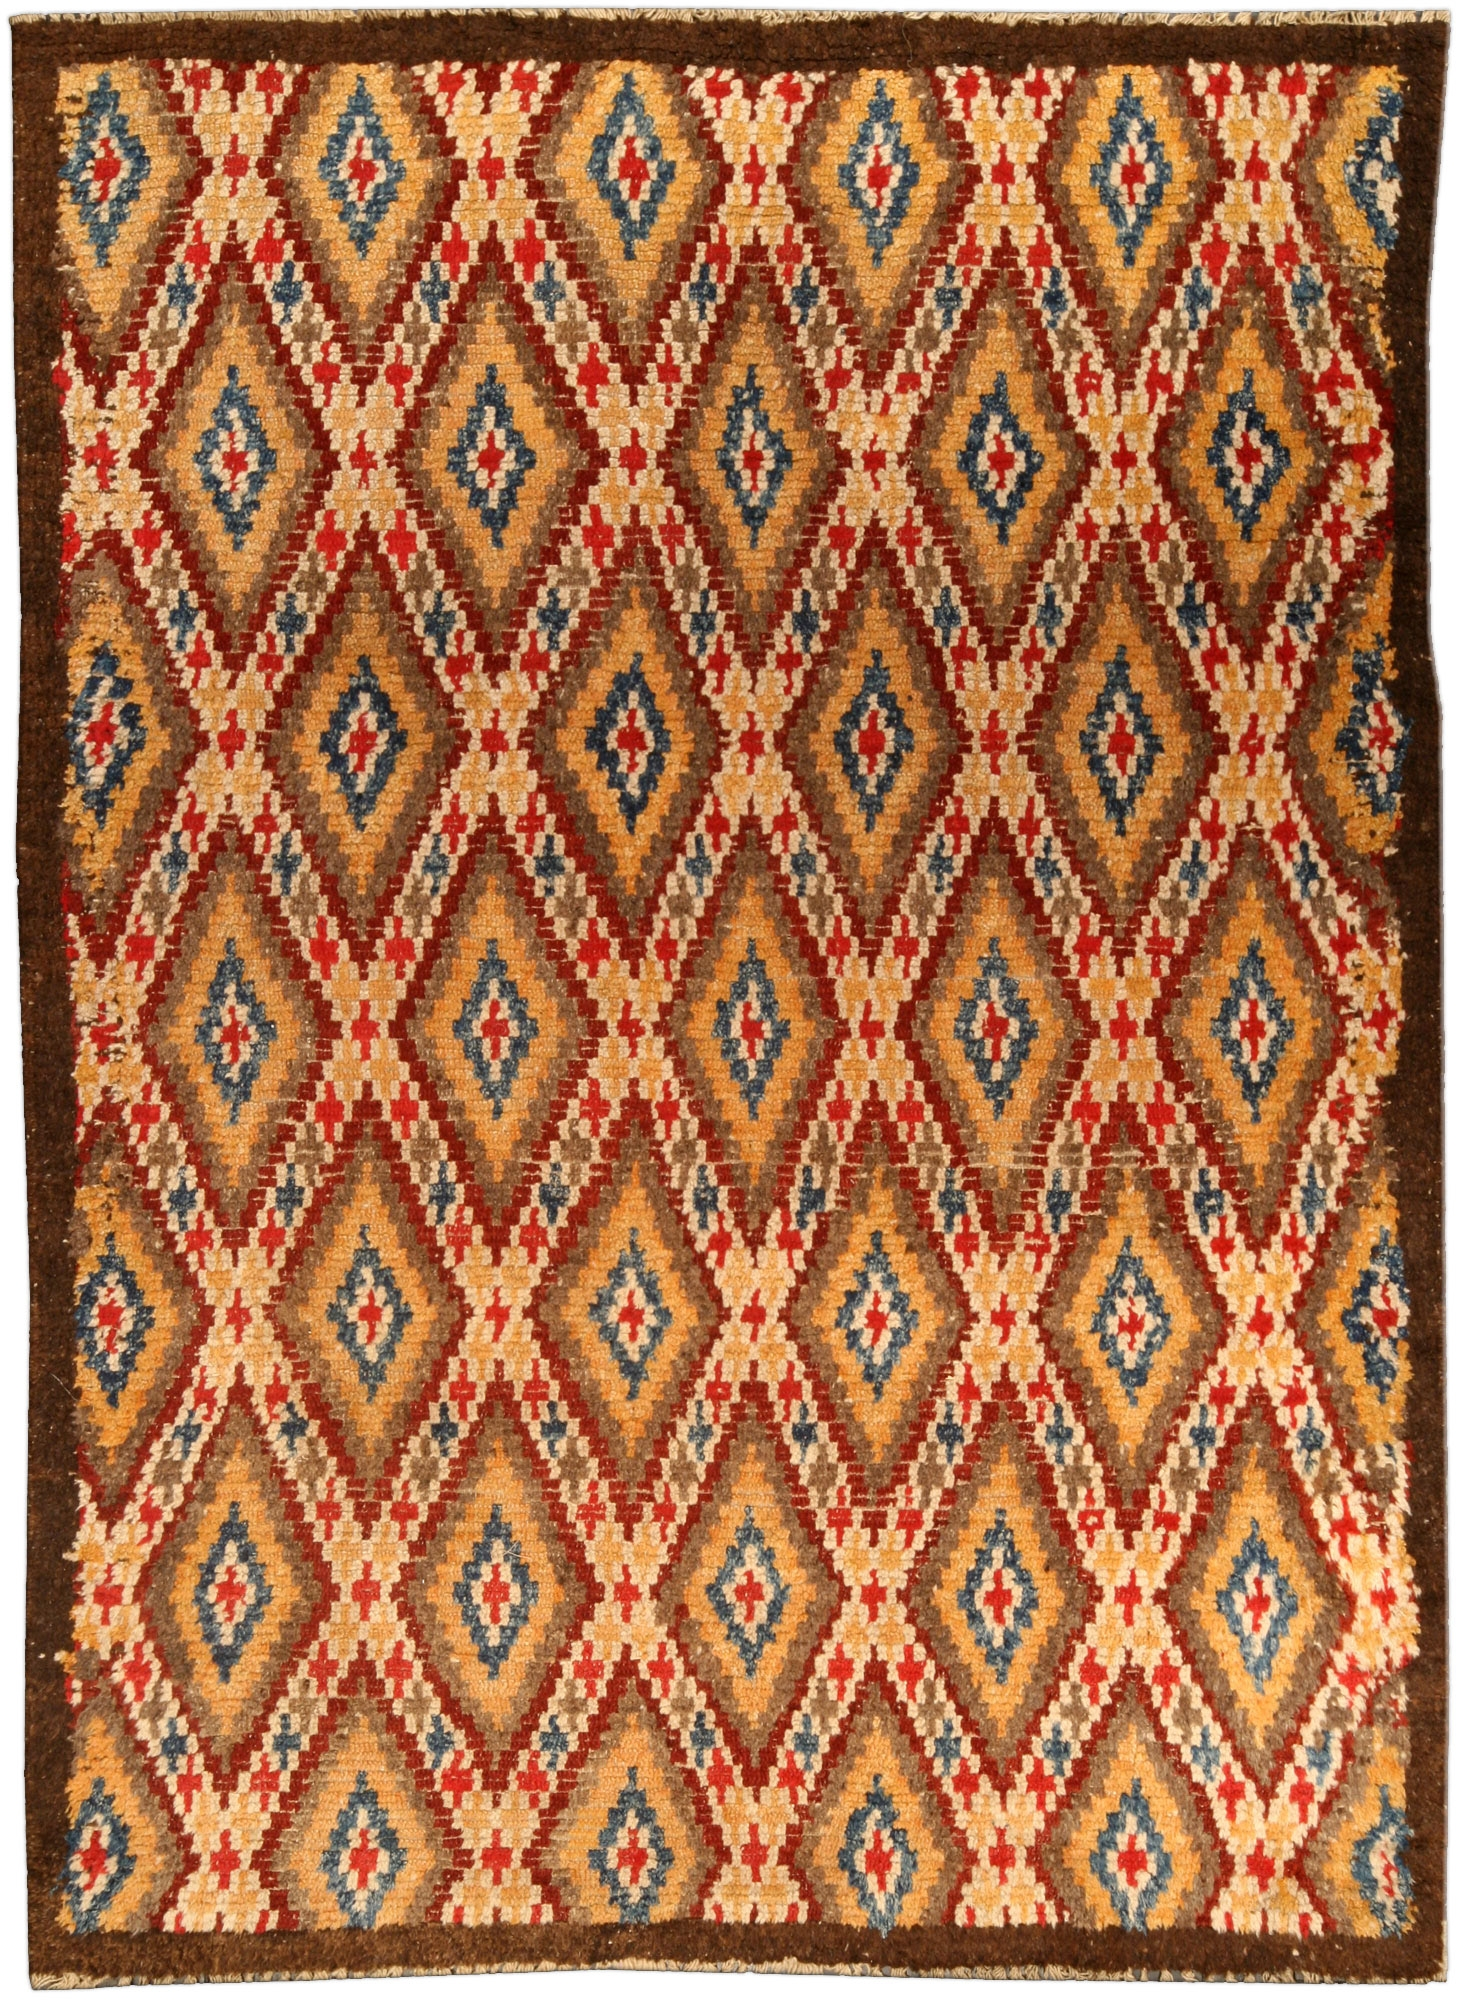 Vintage Moroccan Rug Bb4550 Doris Leslie Blau Regarding Moroccan Rugs (Image 11 of 15)